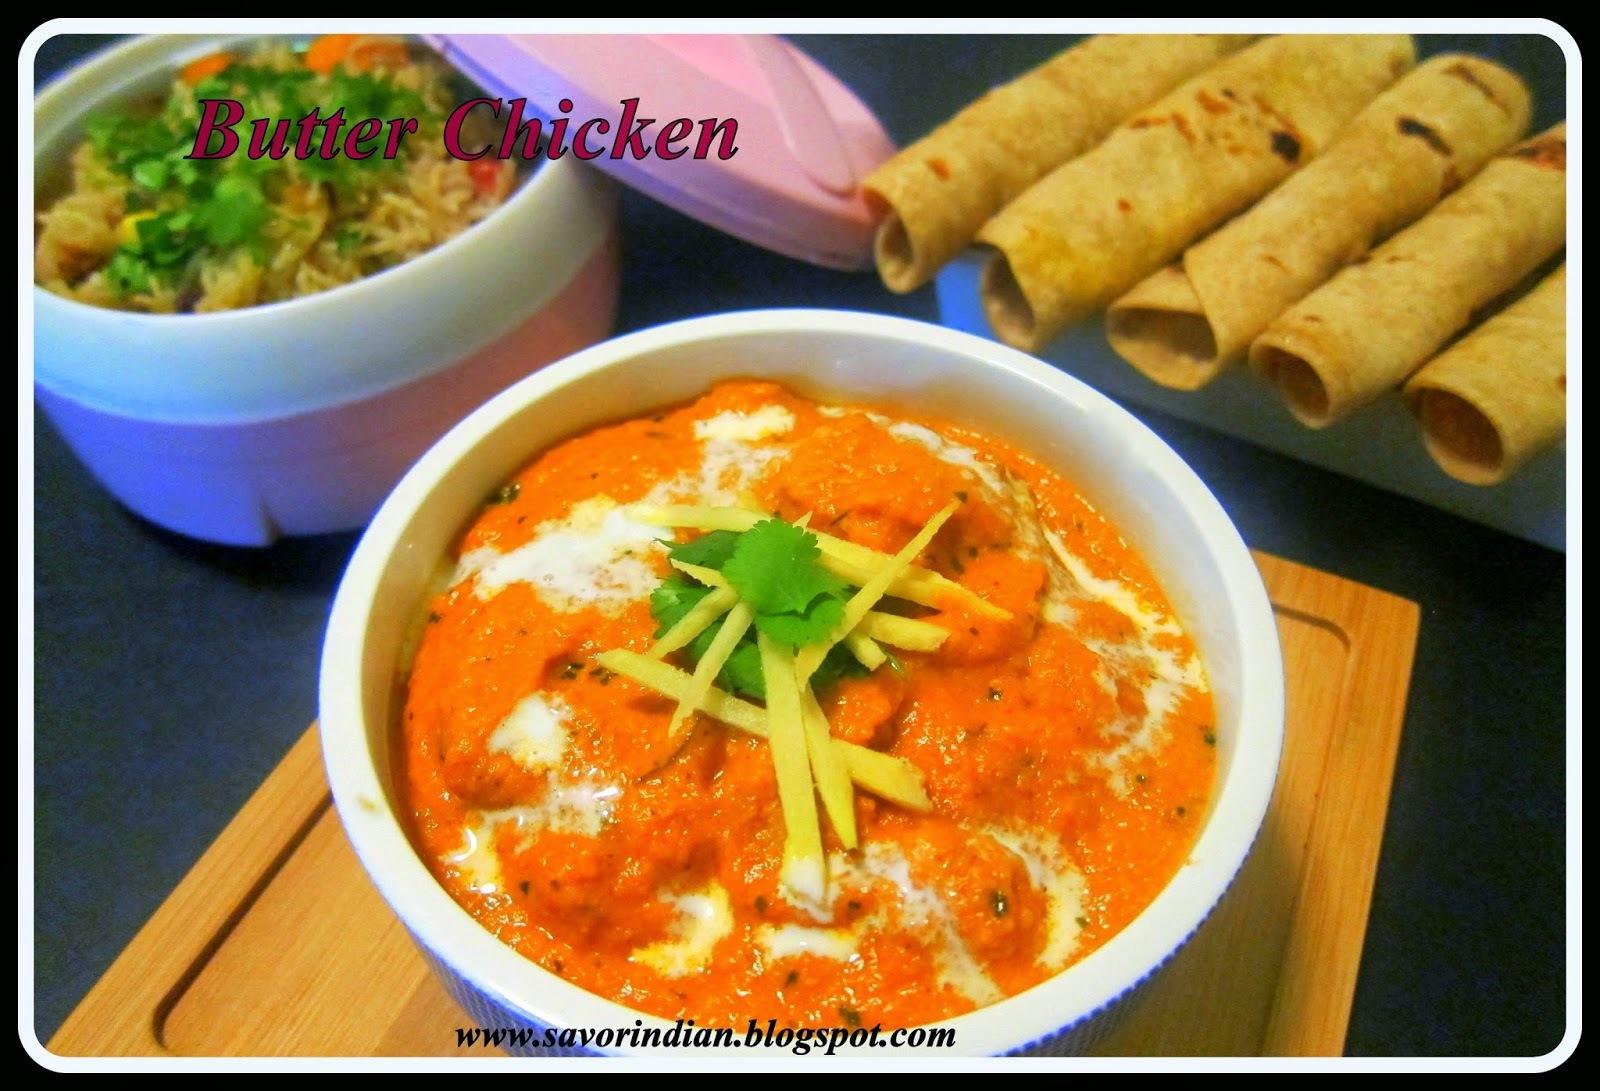 Restaurant Style Butter Chicken Recipe /Indian Butter Chicken Recipe/Chicken (Murgh) Makhani